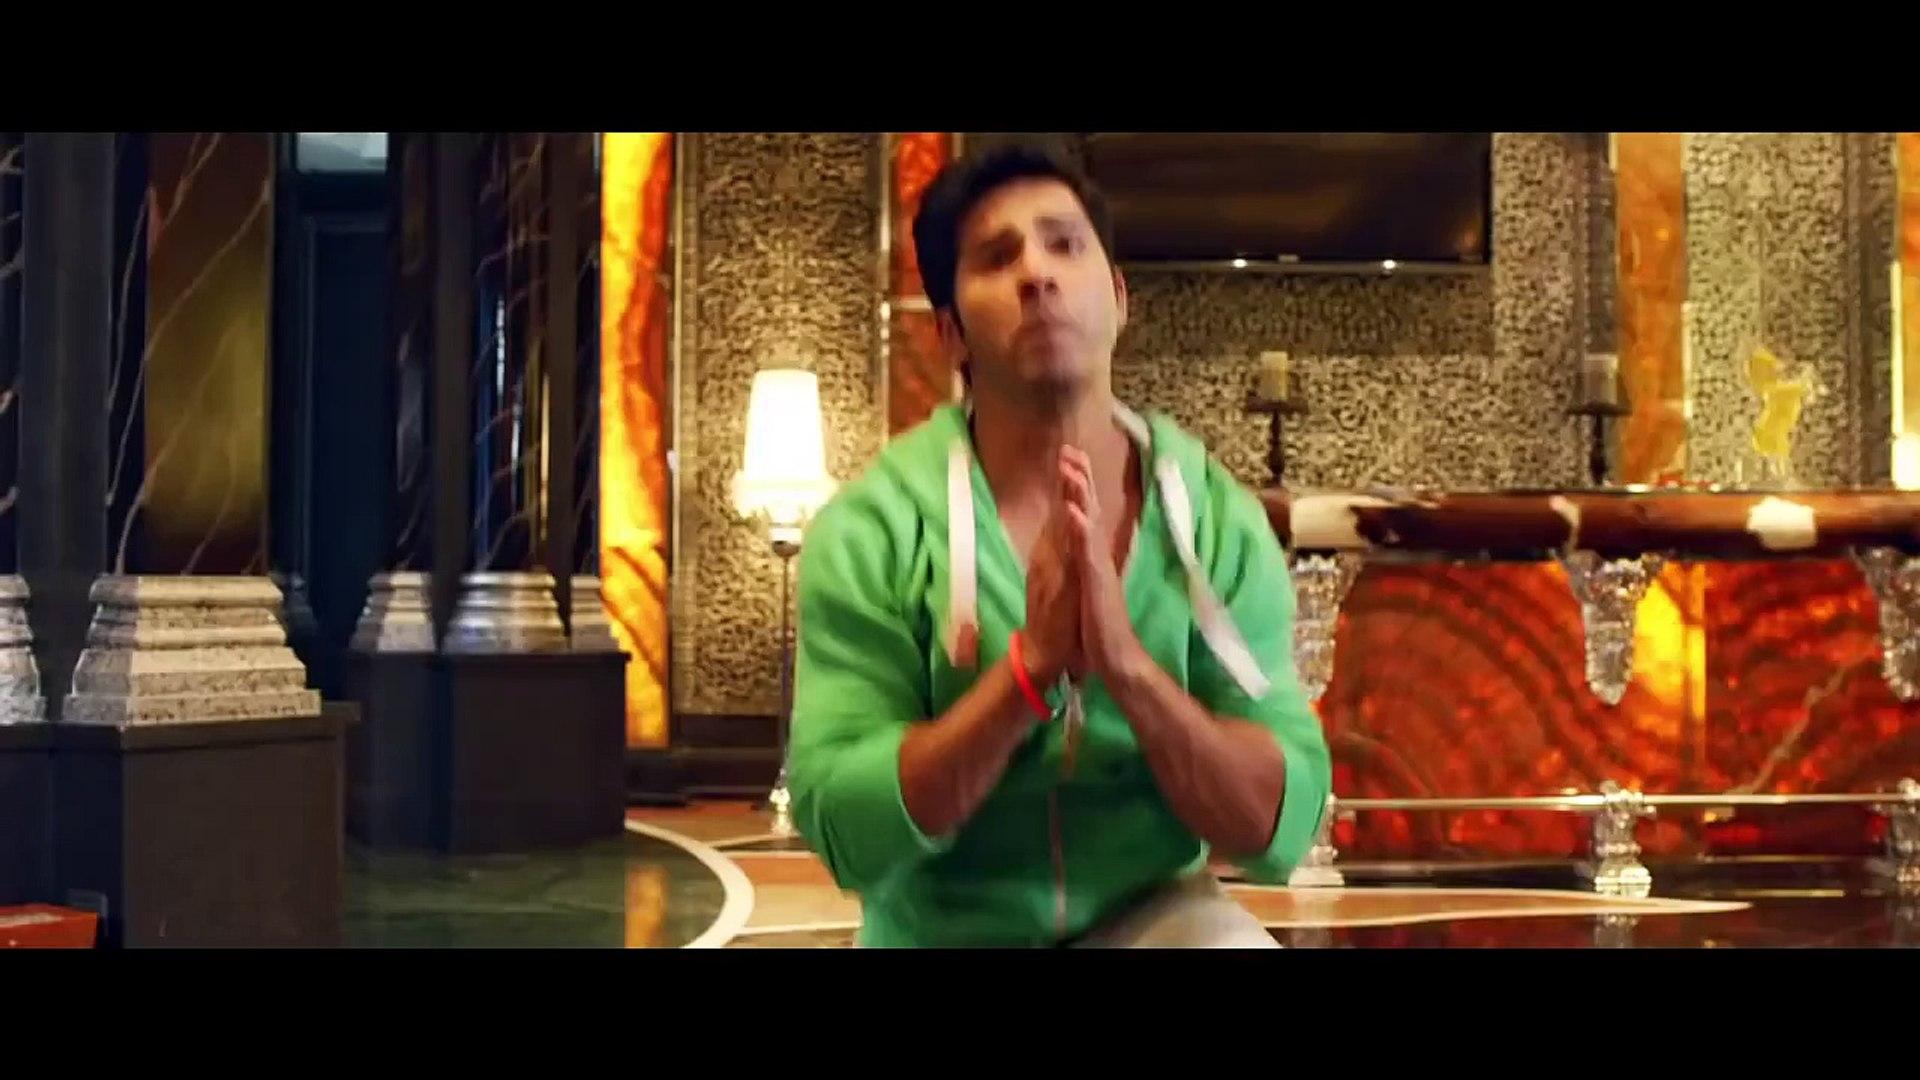 Main Tera Hero Bholenath Ji Bhajan on the Dance Floor